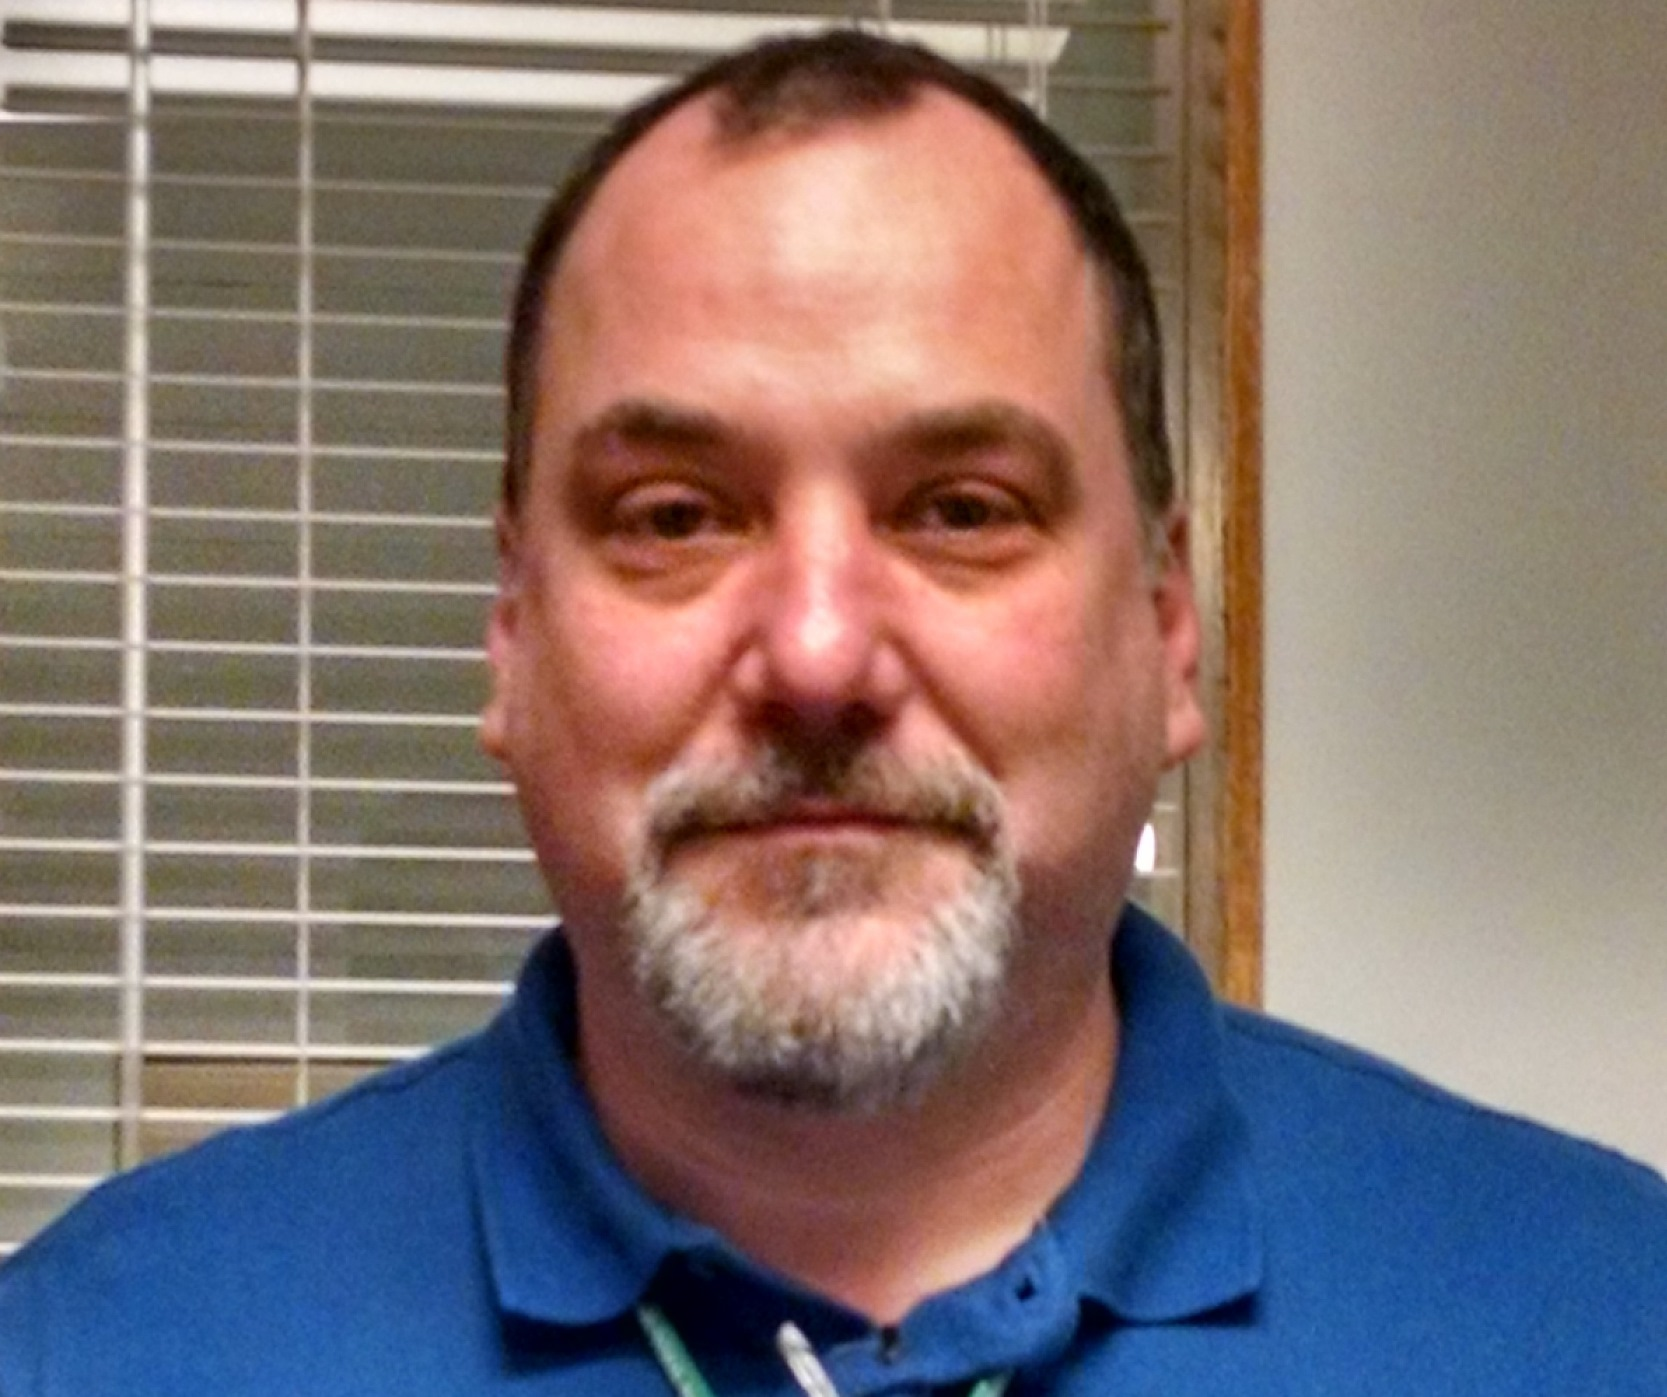 Superintendent Bldg Maintenance